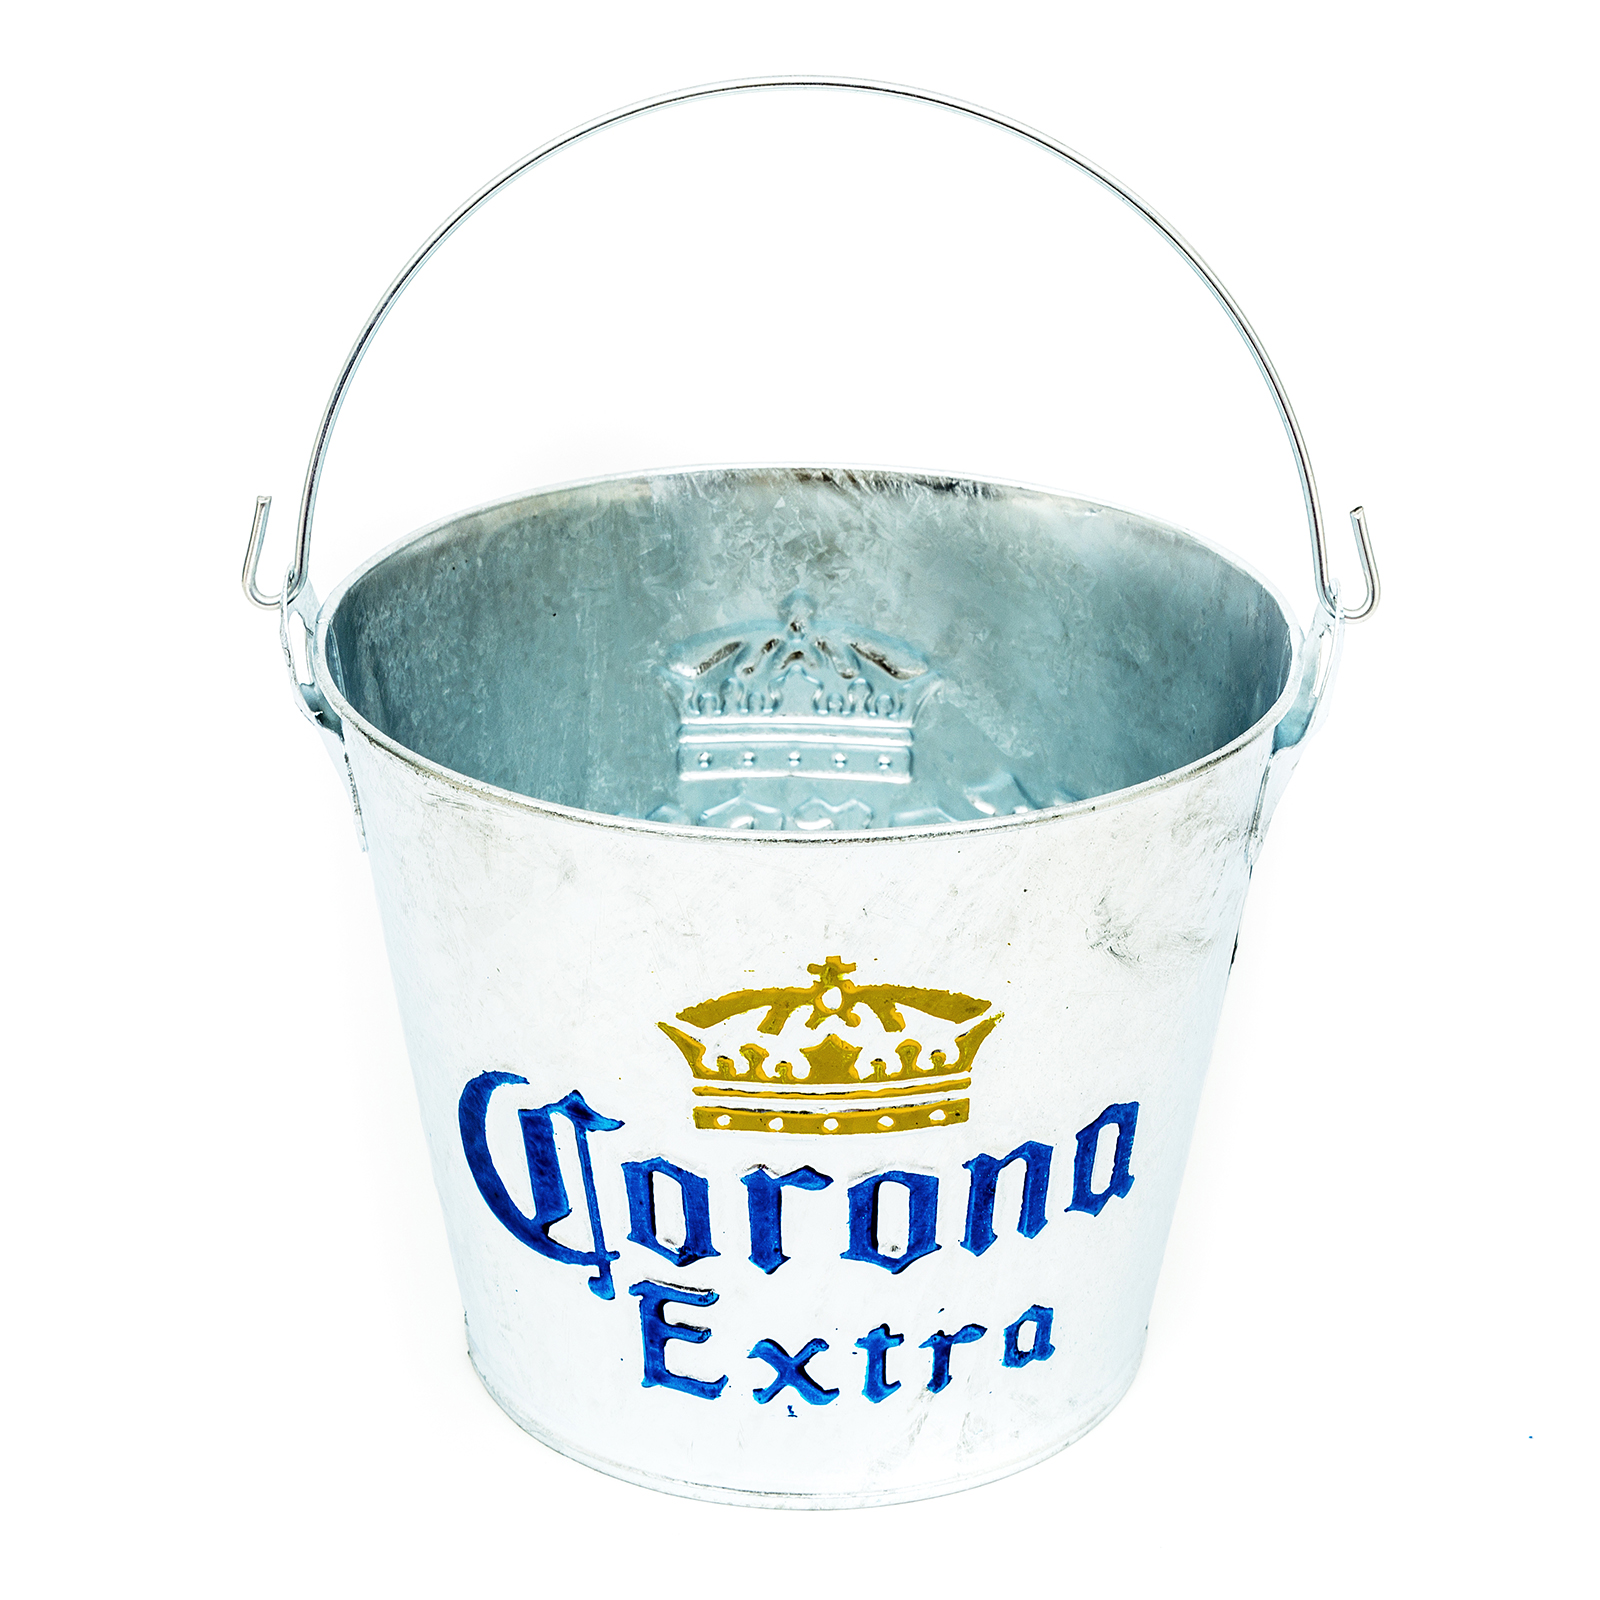 Corona Galvanisiert Stil Metall Eis Eimer Party Drink Halter Kühler Heim bar Pub